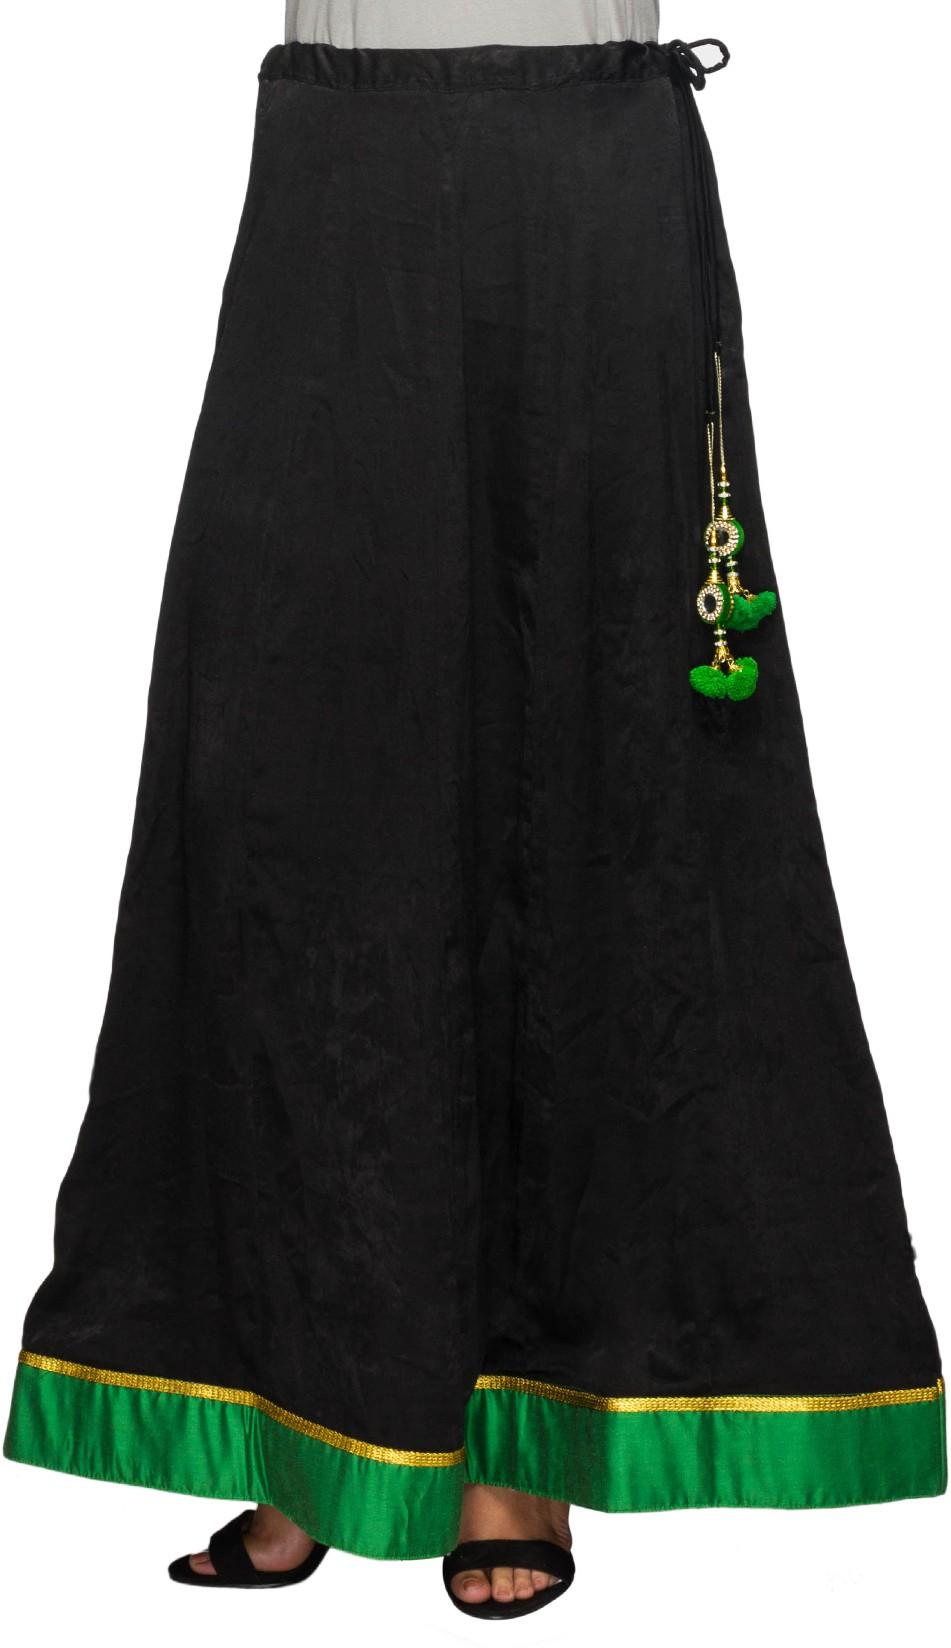 Arshvi Solid Womens Broomstick Black, Green Skirt